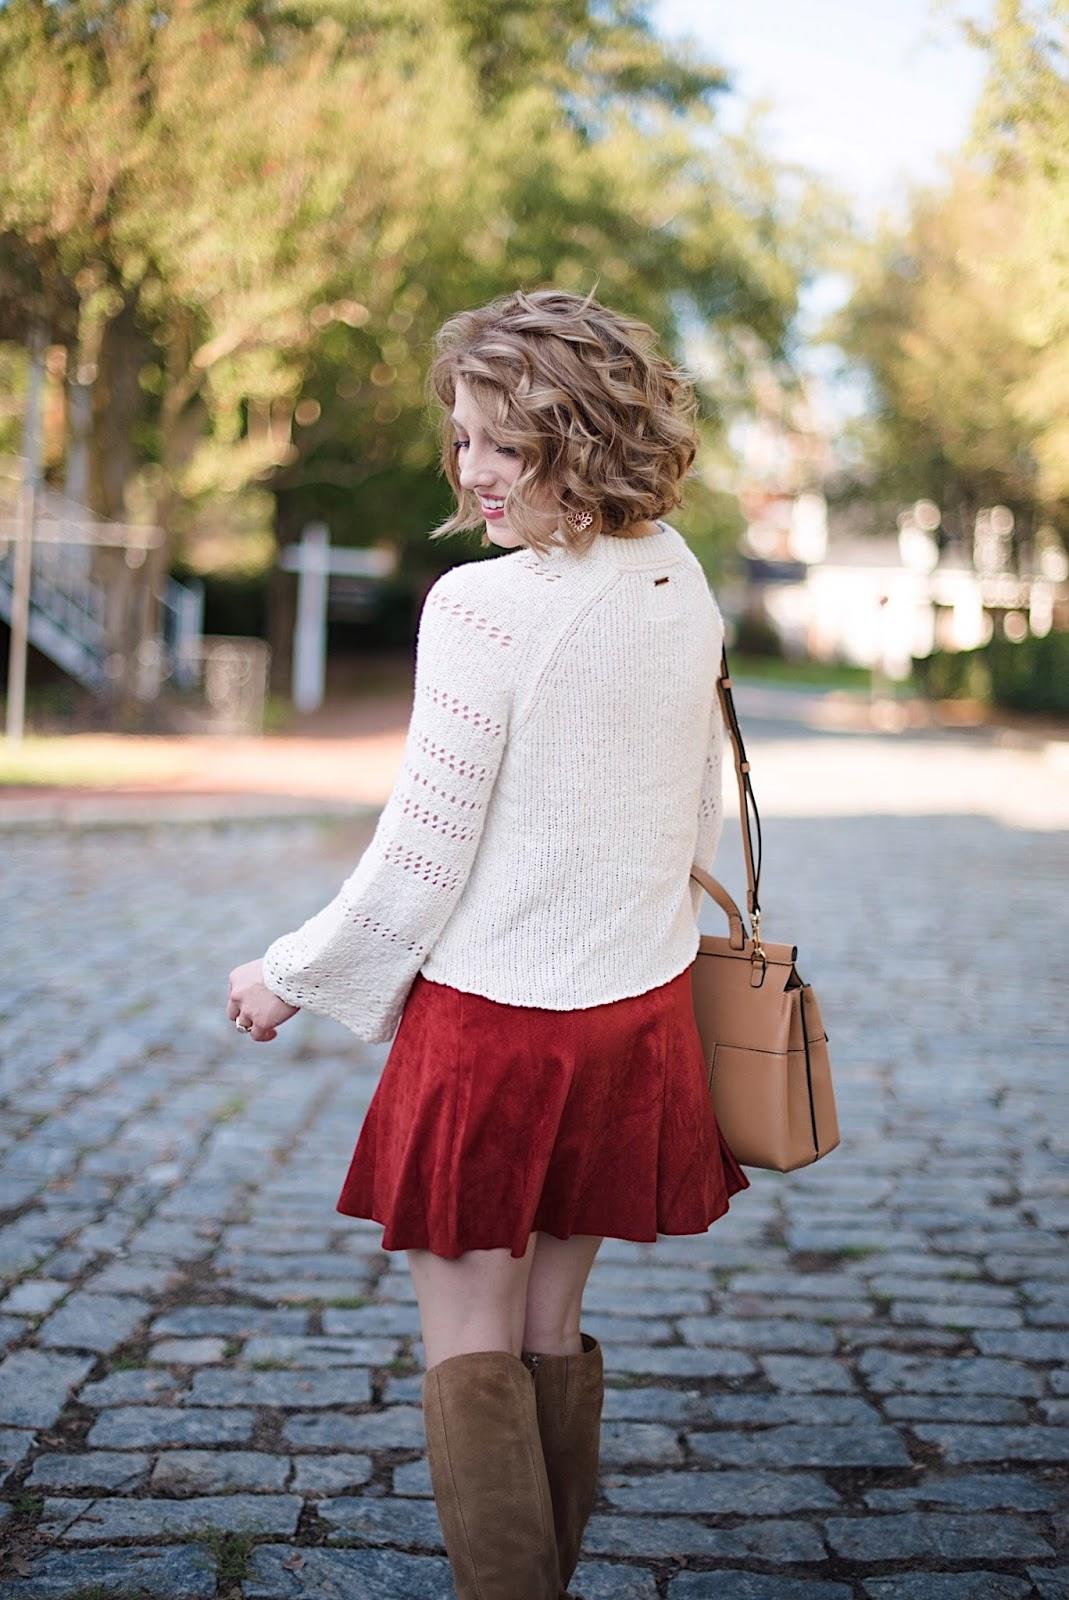 Suede Skirt - Something Delightful Blog